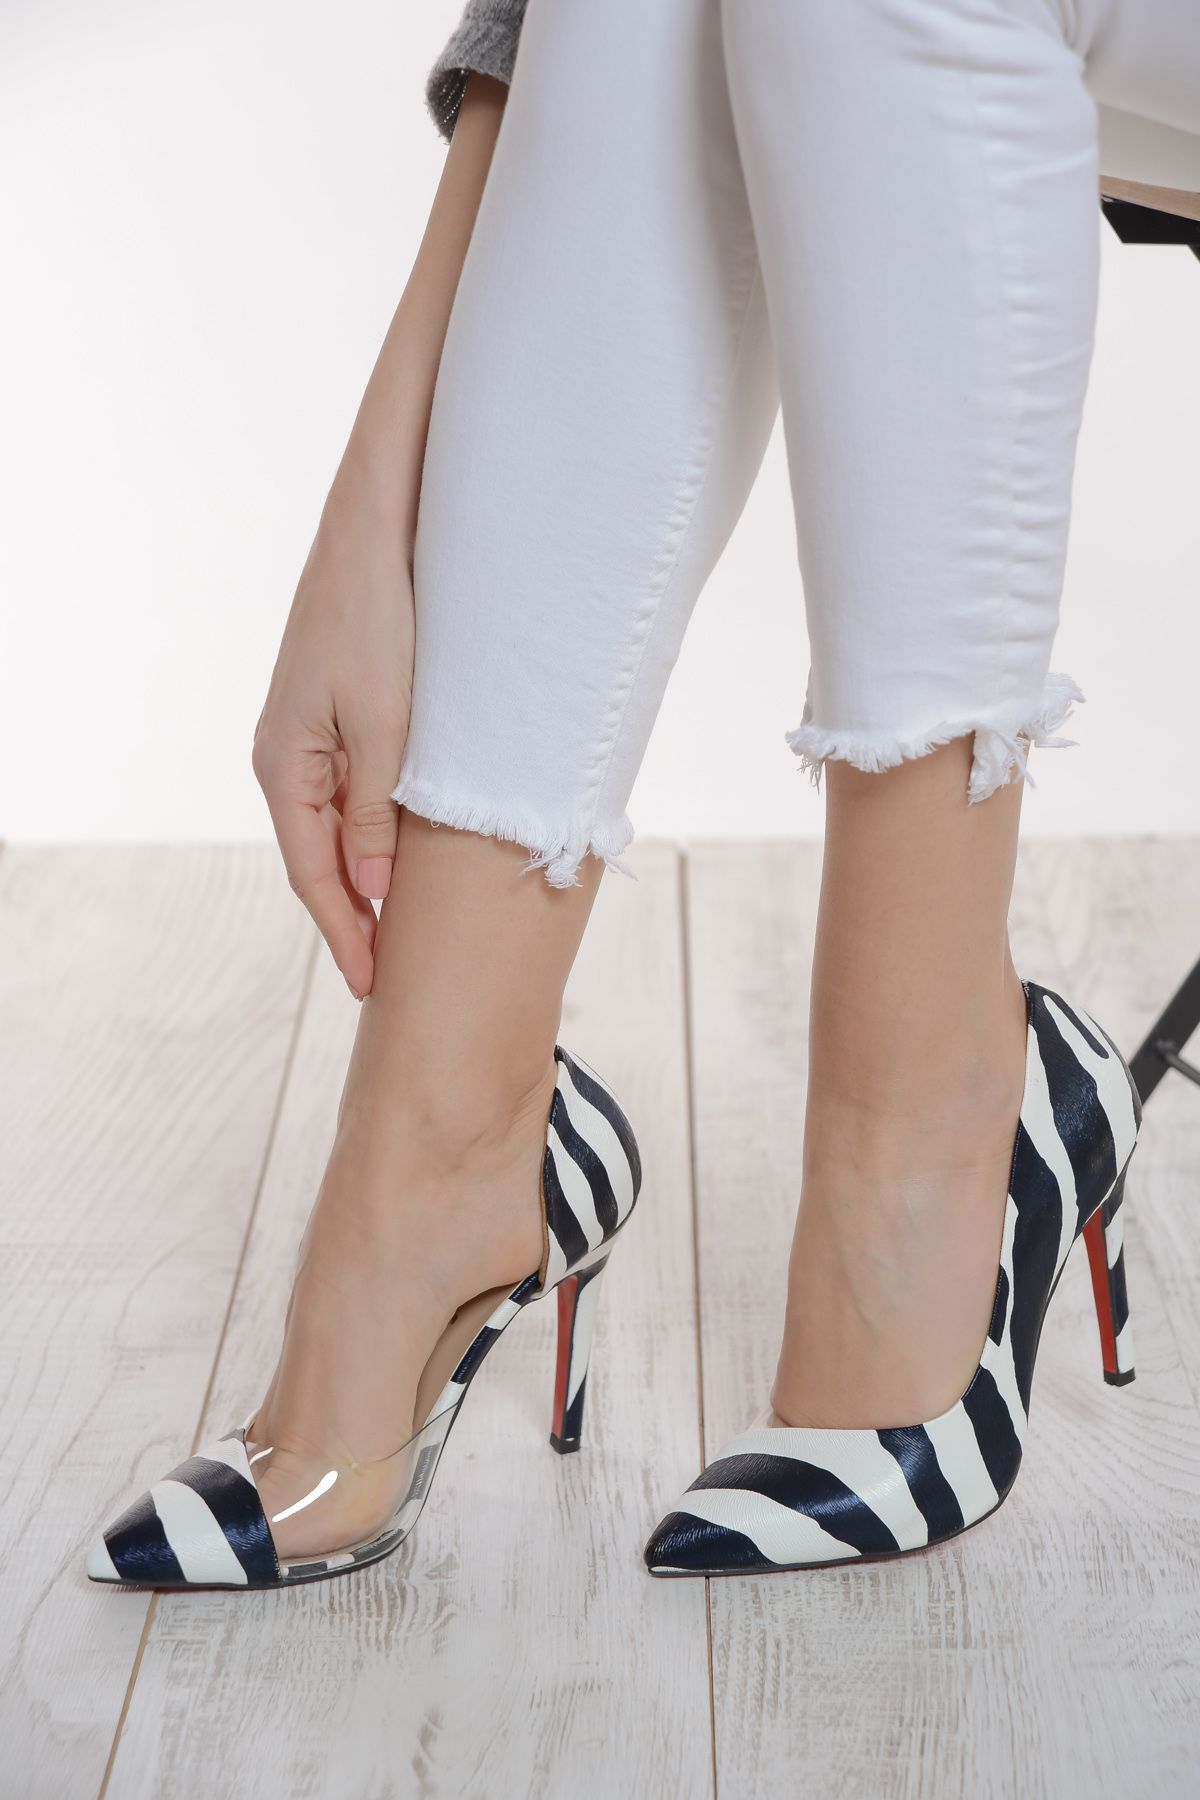 486aaaea0a8 Shoes Time Online Ayakkabı Mağazası